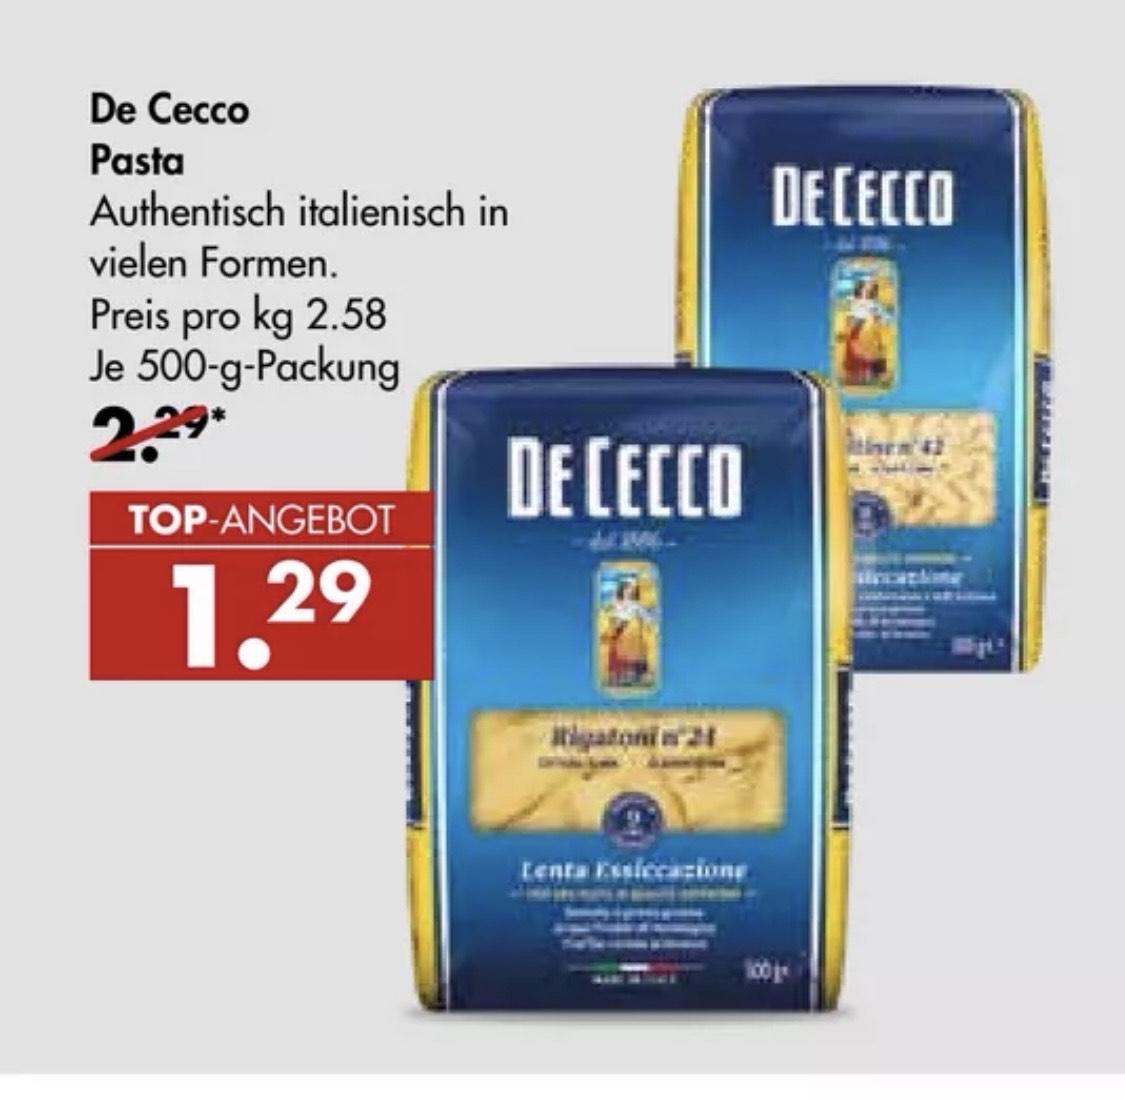 De Cecco Nudeln Pasta - versch. Sorten Karstadt Kaufhof